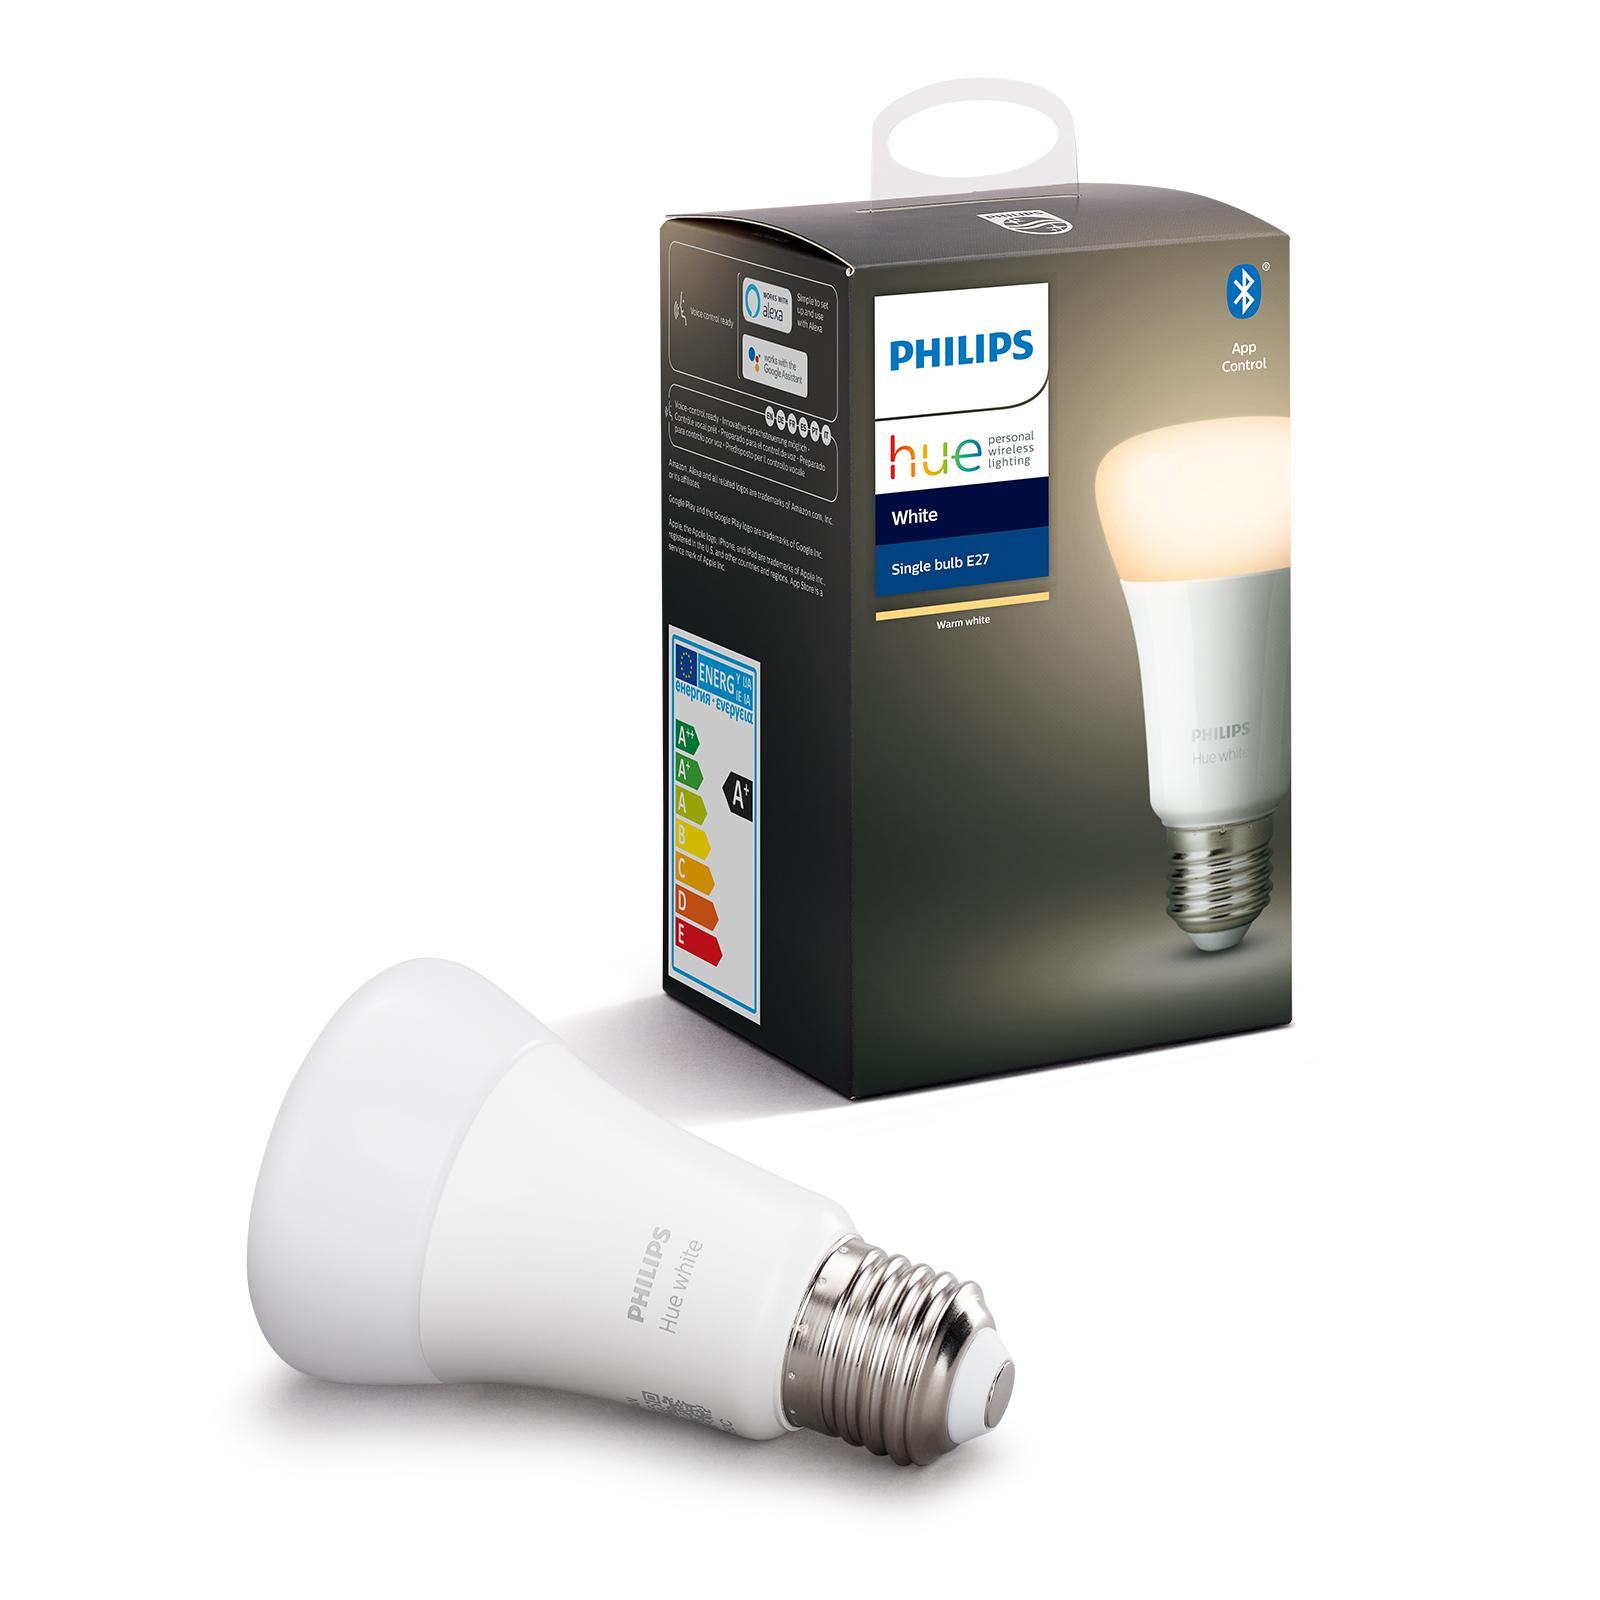 Philips Hue White 9 W E27 żarówka LED